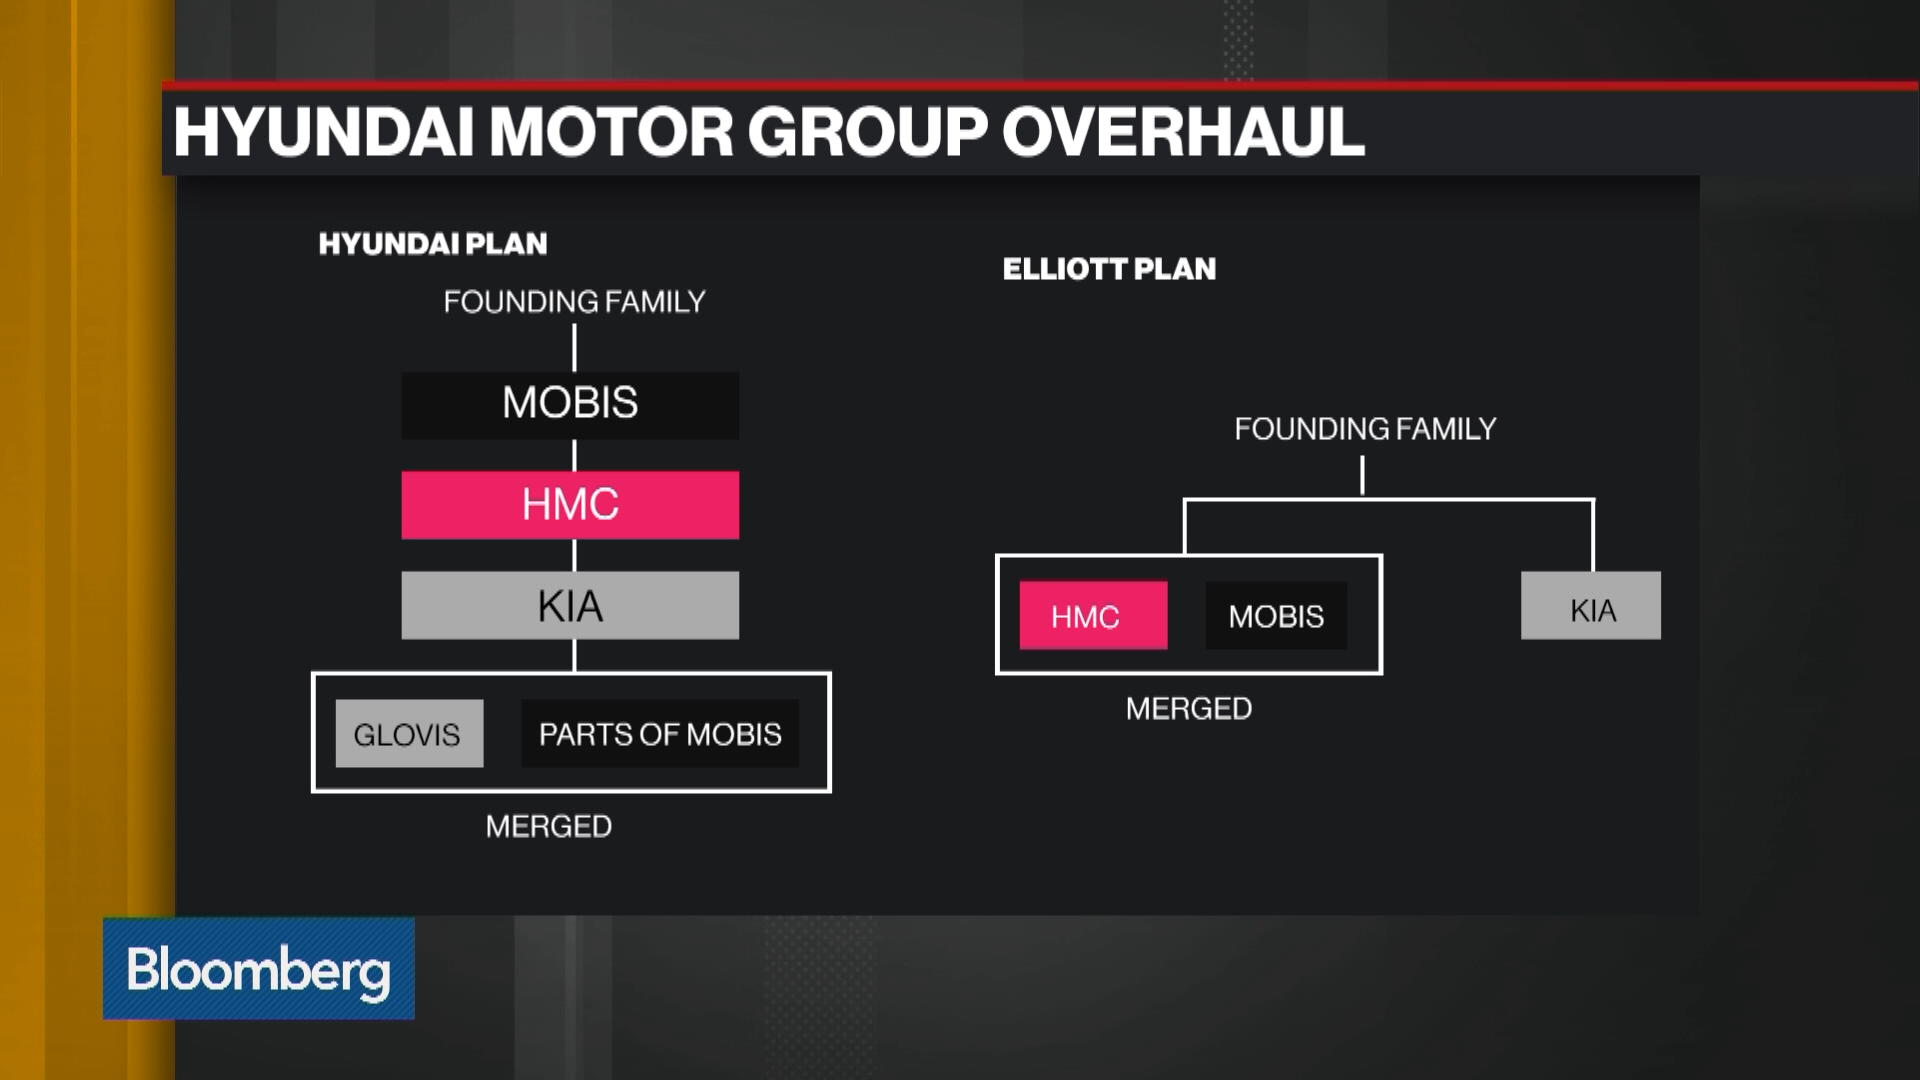 Hyundai motor caves in to elliott scraps 8 8 billion for Hyundai motor finance corporate office